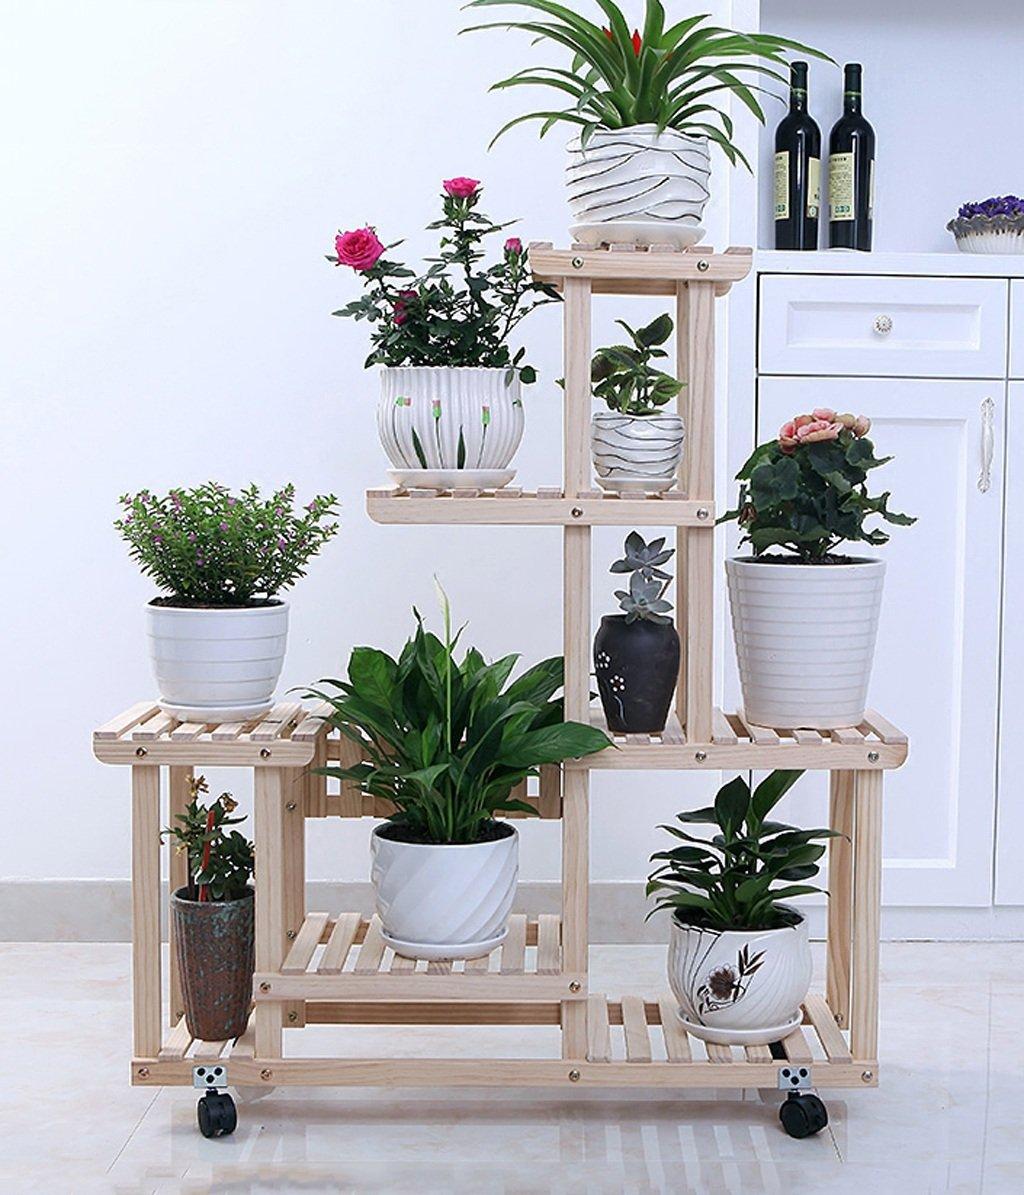 Amazon.com : ZENGAI Solid Wood Flower Racks Move The Pulley Indoor Assembly Pots Showcase, 2 Colors Plant Container (Color : 2#, Size : 852596cm) : Garden & ...